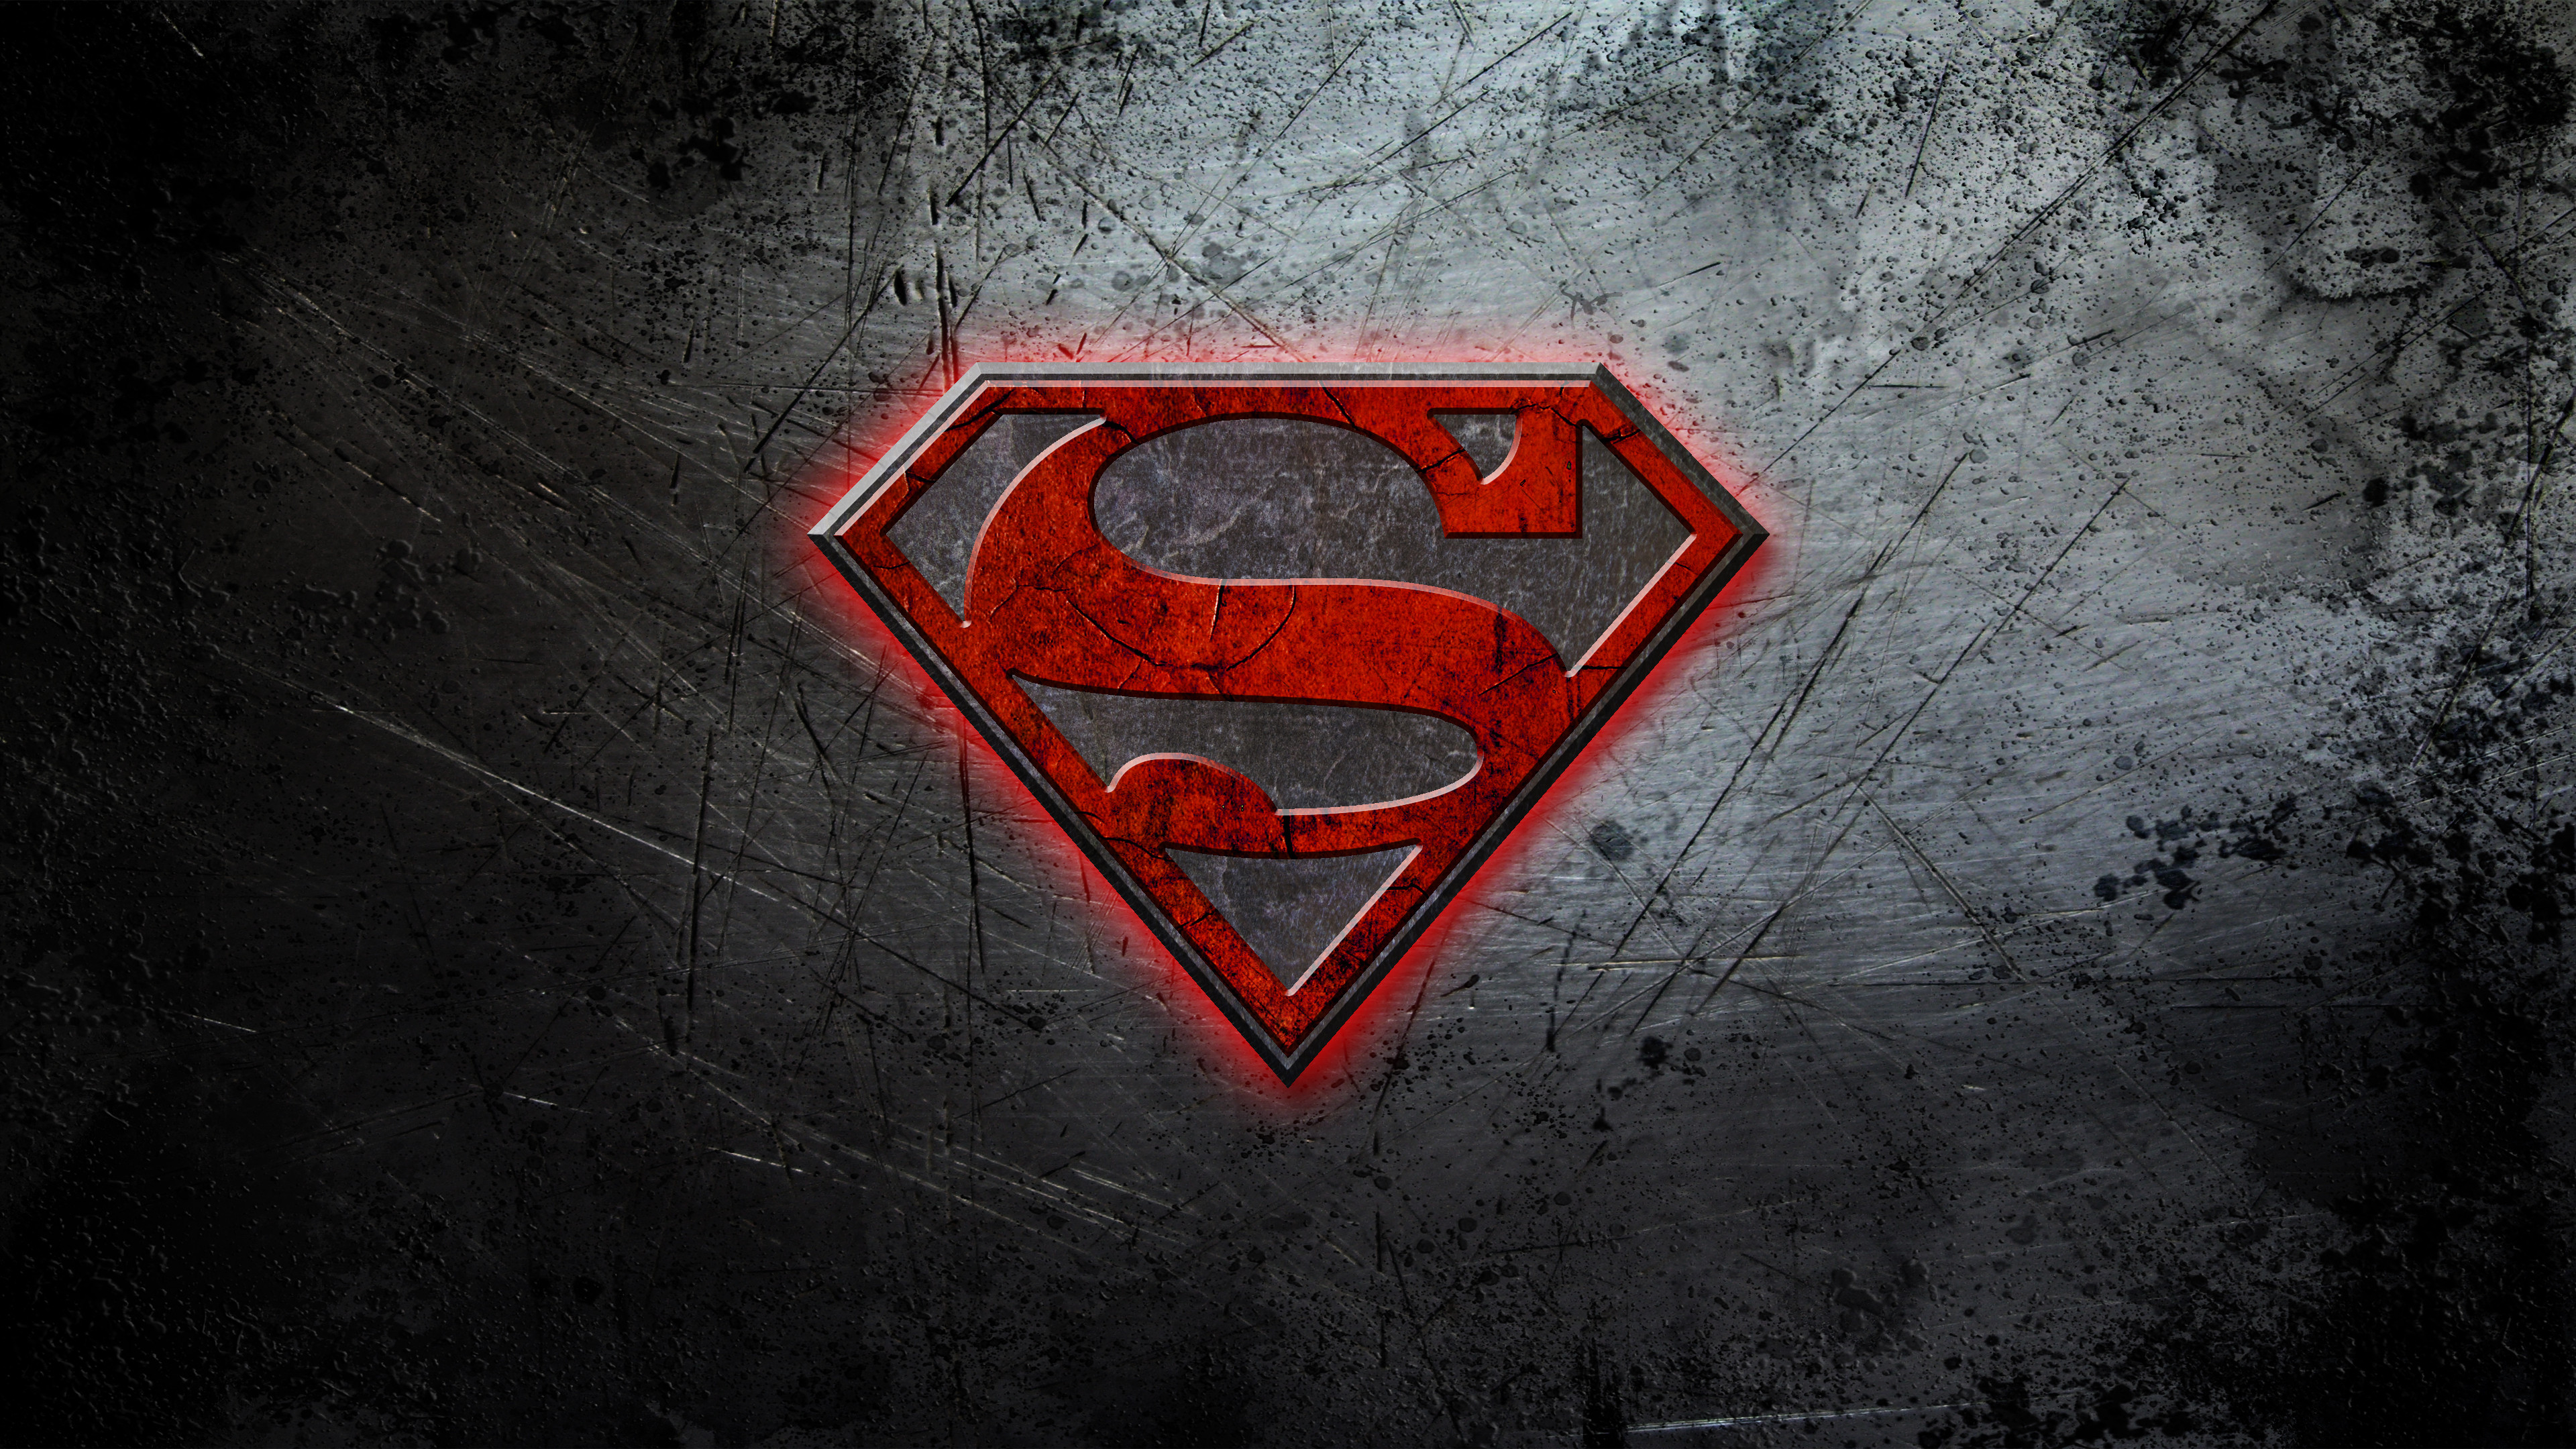 Superman Logo 4k Hd Superheroes 4k Wallpapers Images Backgrounds